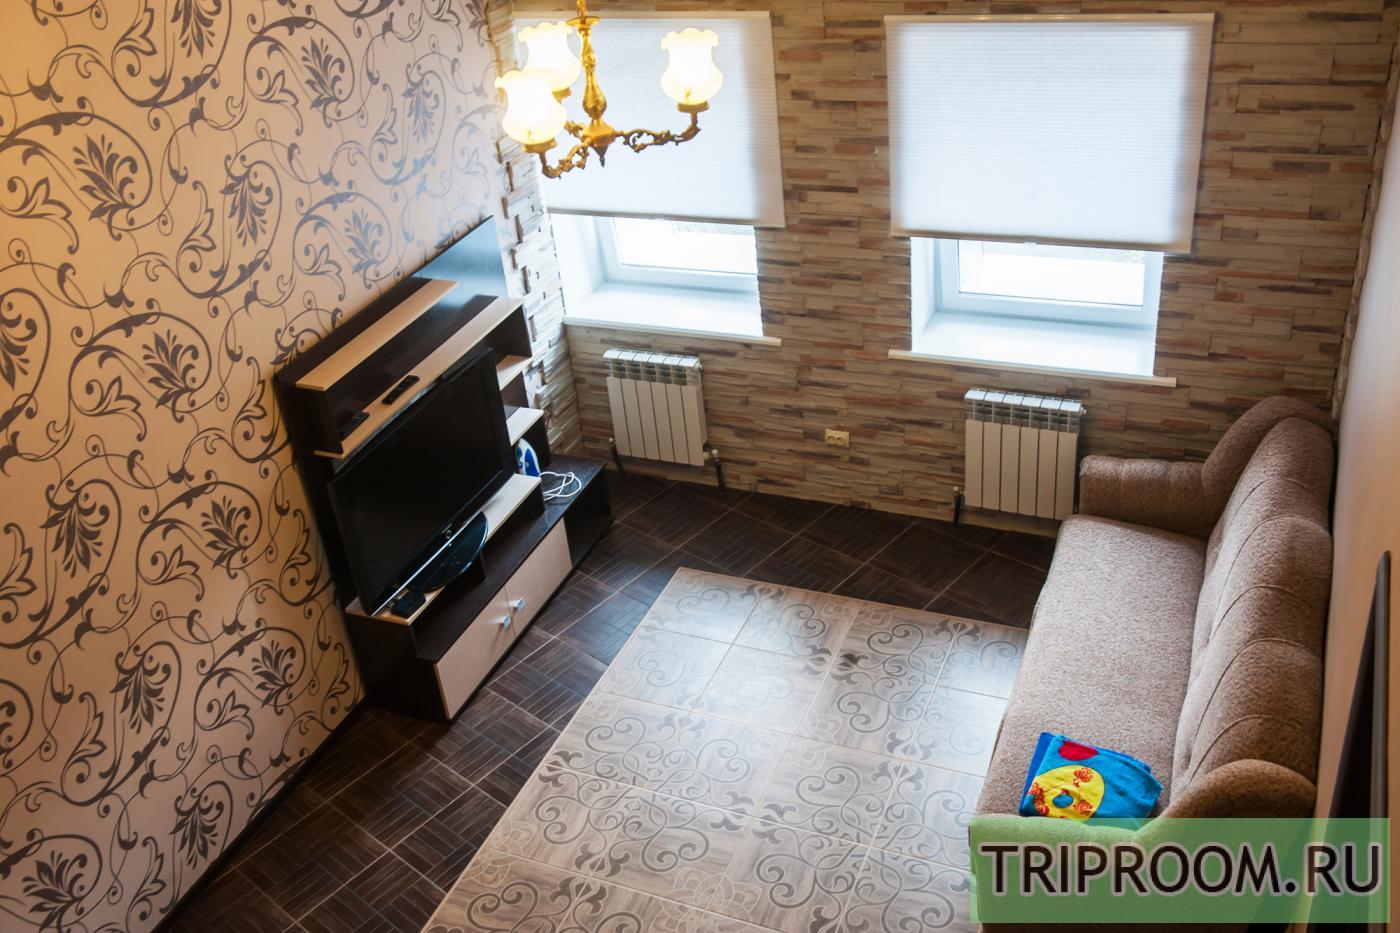 2-комнатная квартира посуточно (вариант № 12765), ул. Кронштадский переулок, фото № 10